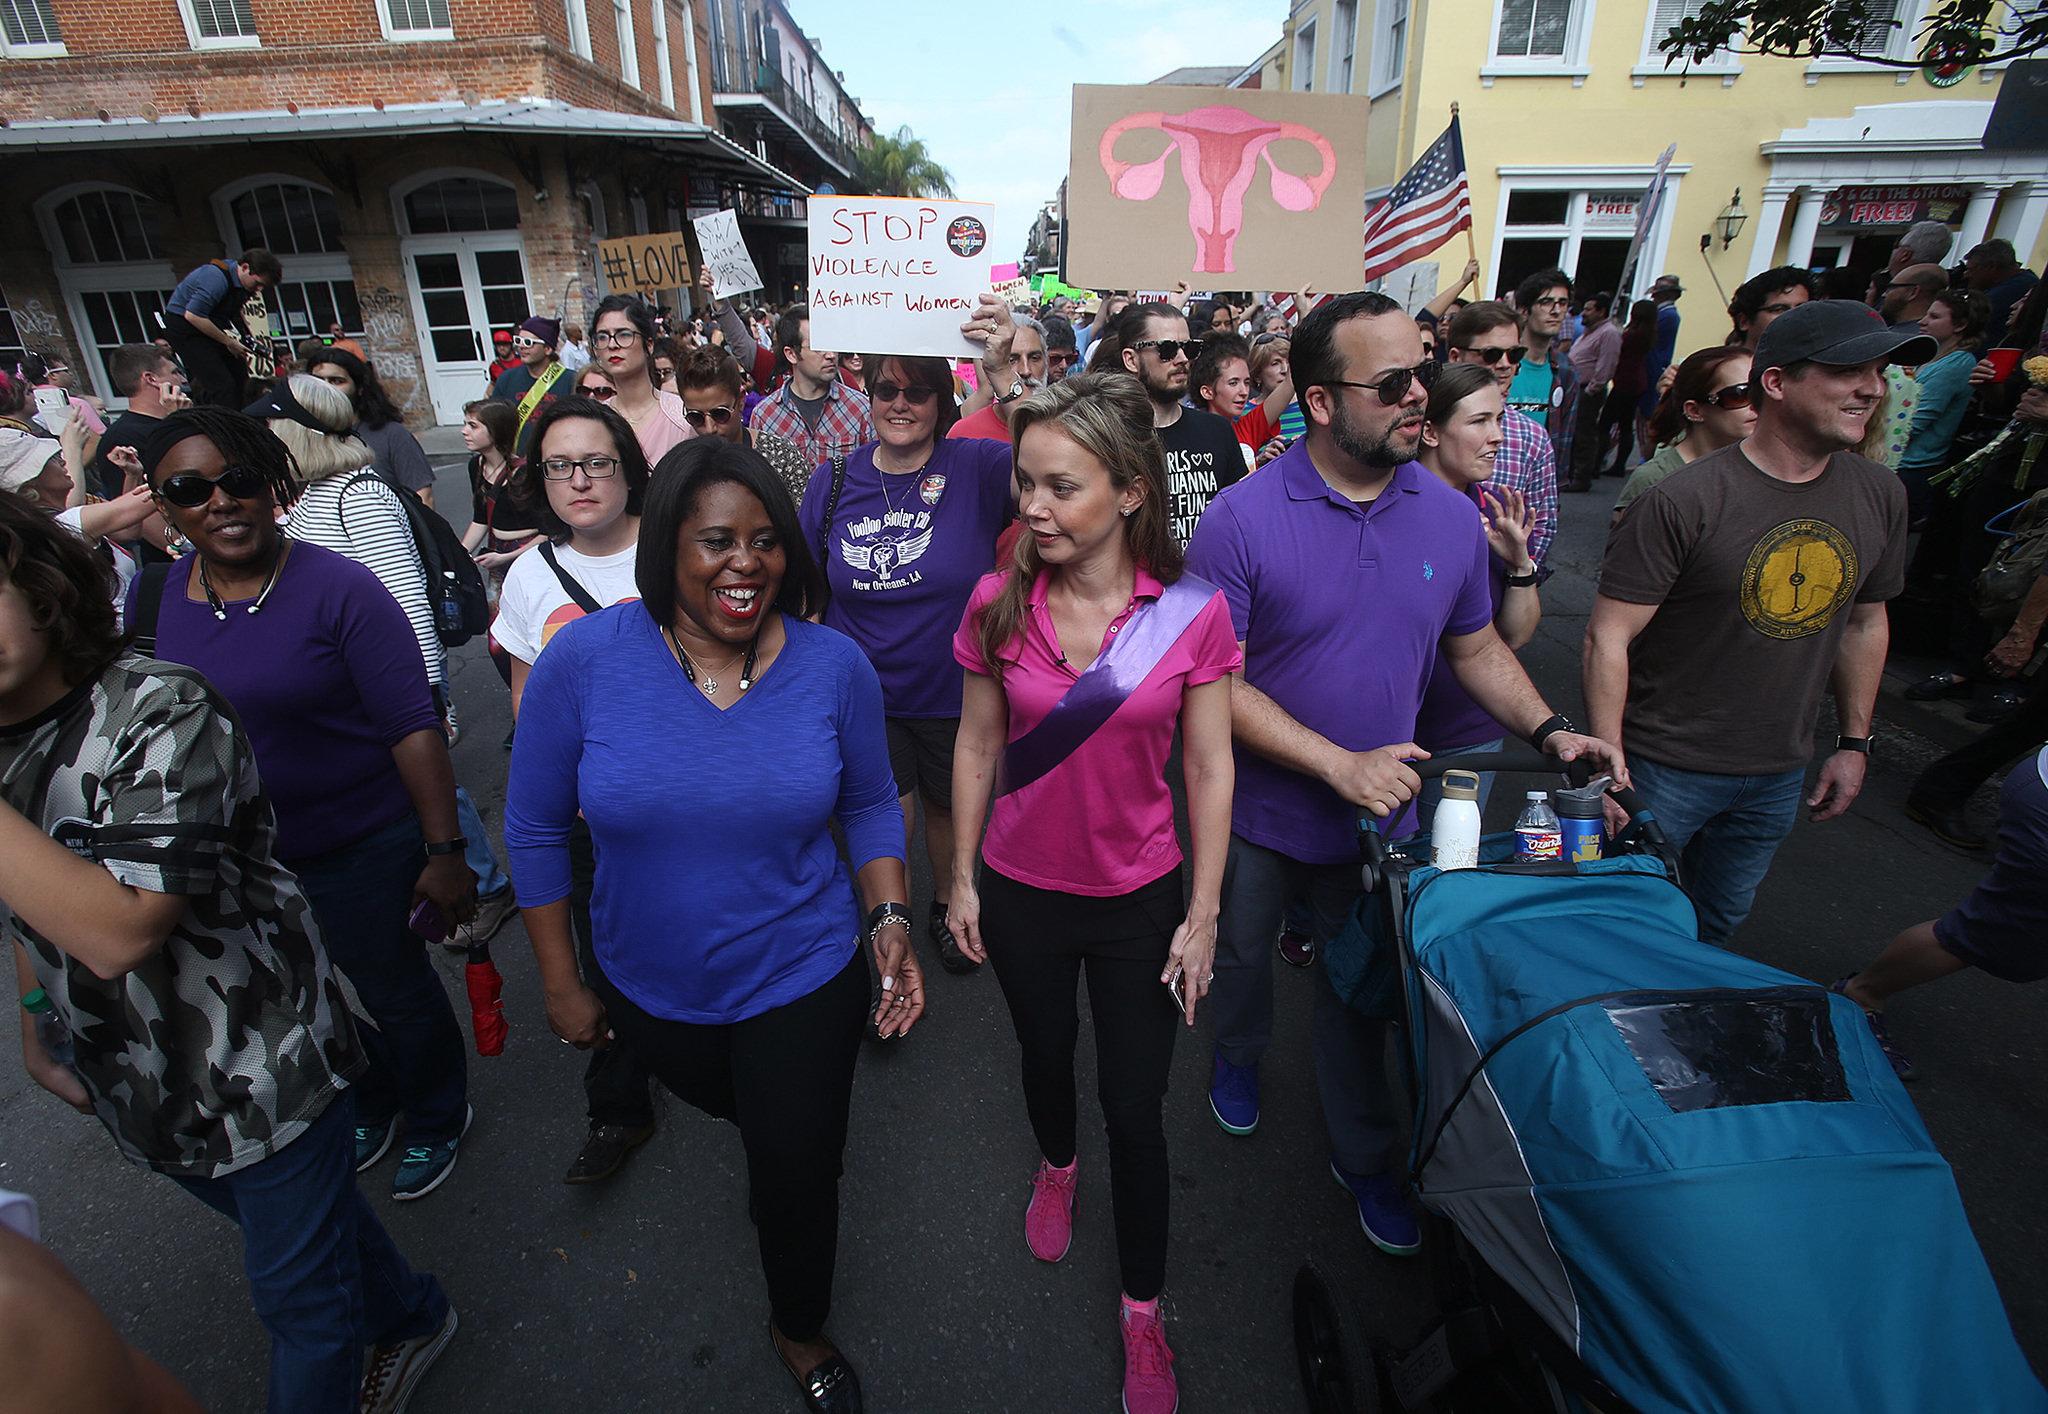 Photo Credit: Nola.com. Retrieved 01/22/17. http://www.nola.com/politics/index.ssf/2017/01/new_orleans_politicians_trump.html